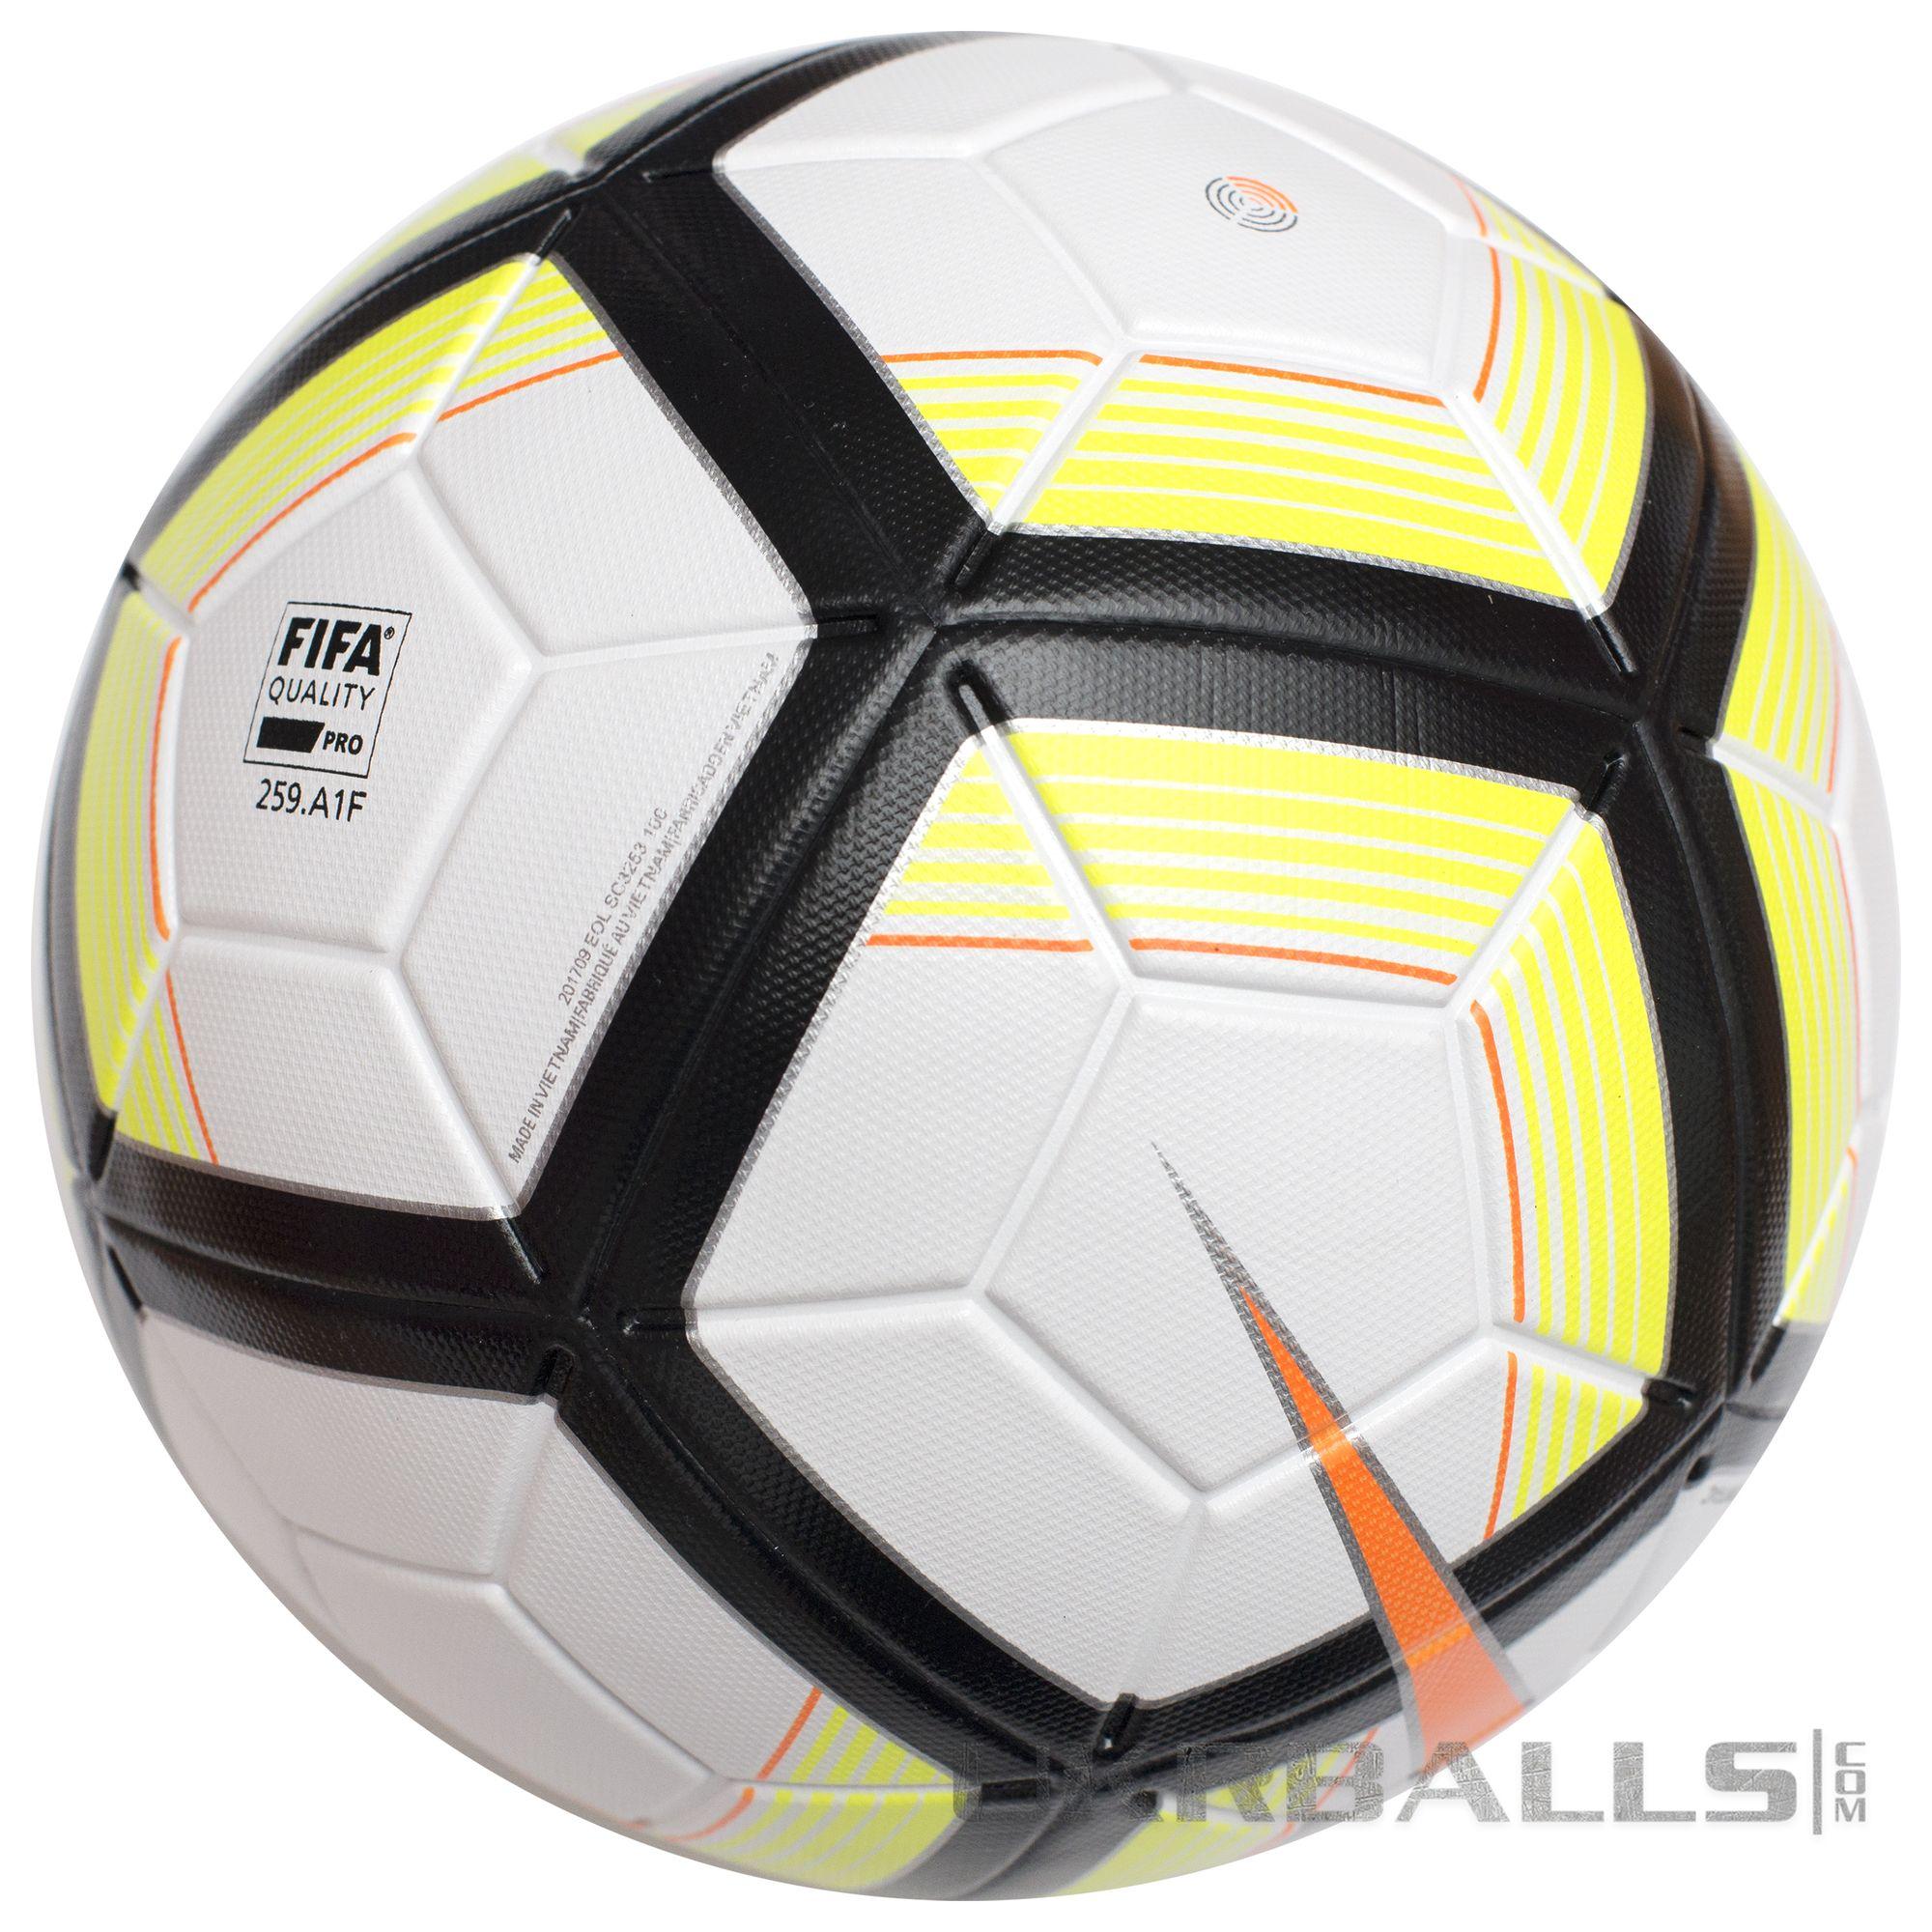 1e67b6e4 Купить футбольный мяч Nike Team FIFA Magia SC3253-100 | UkrBalls.com